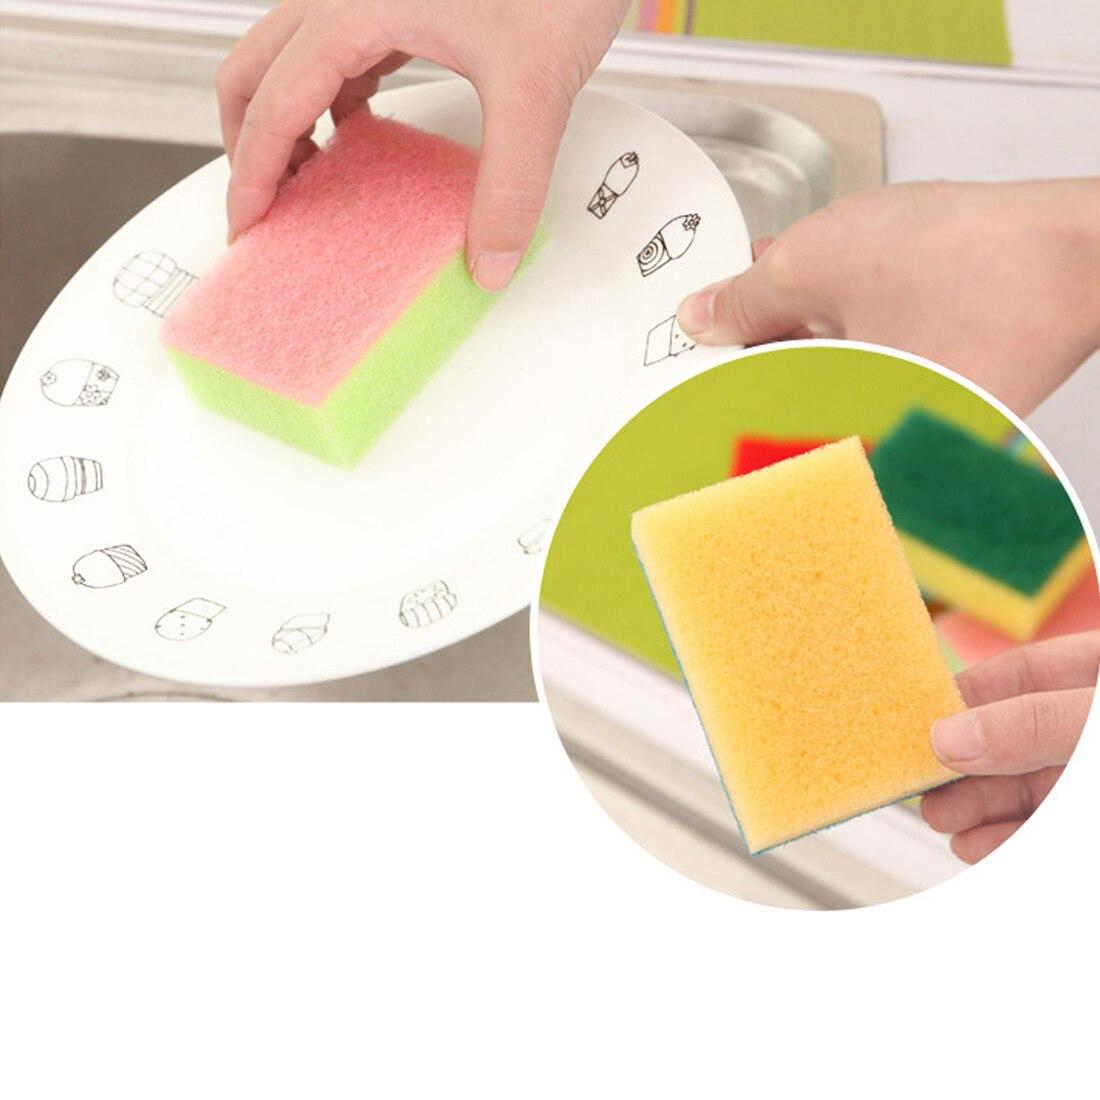 Hot Nano Sponge Magic Eraser For Removing Rust Cleaning Cotton Emery Sponge Kitchen Supplies Descaling Clean Rub Pot